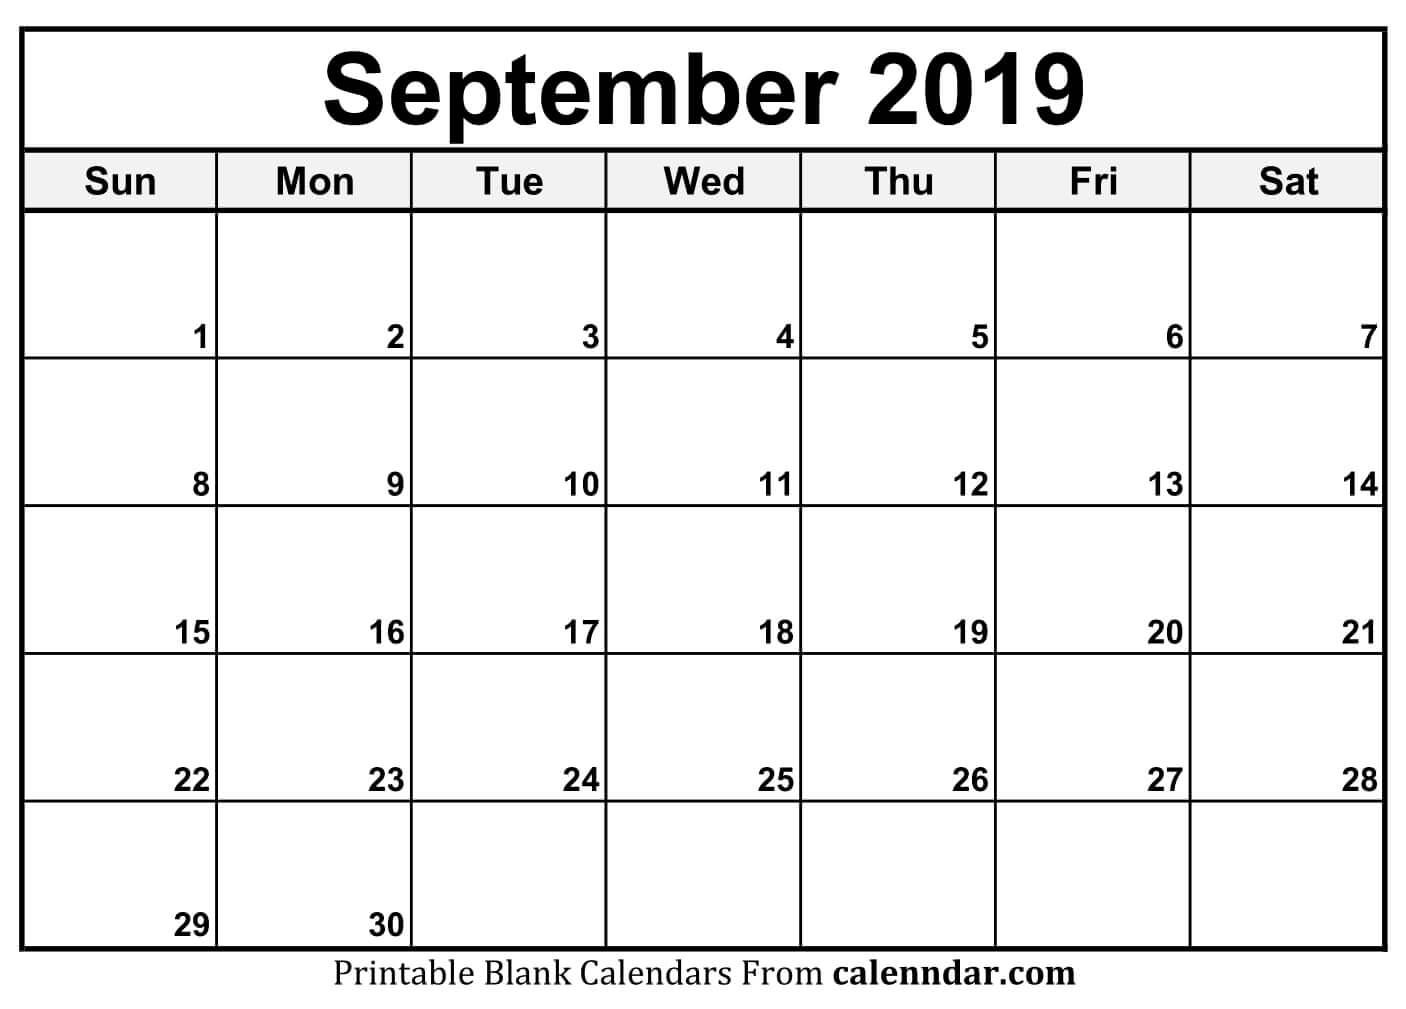 Blank September 2019 Calendar Templates Calenndar